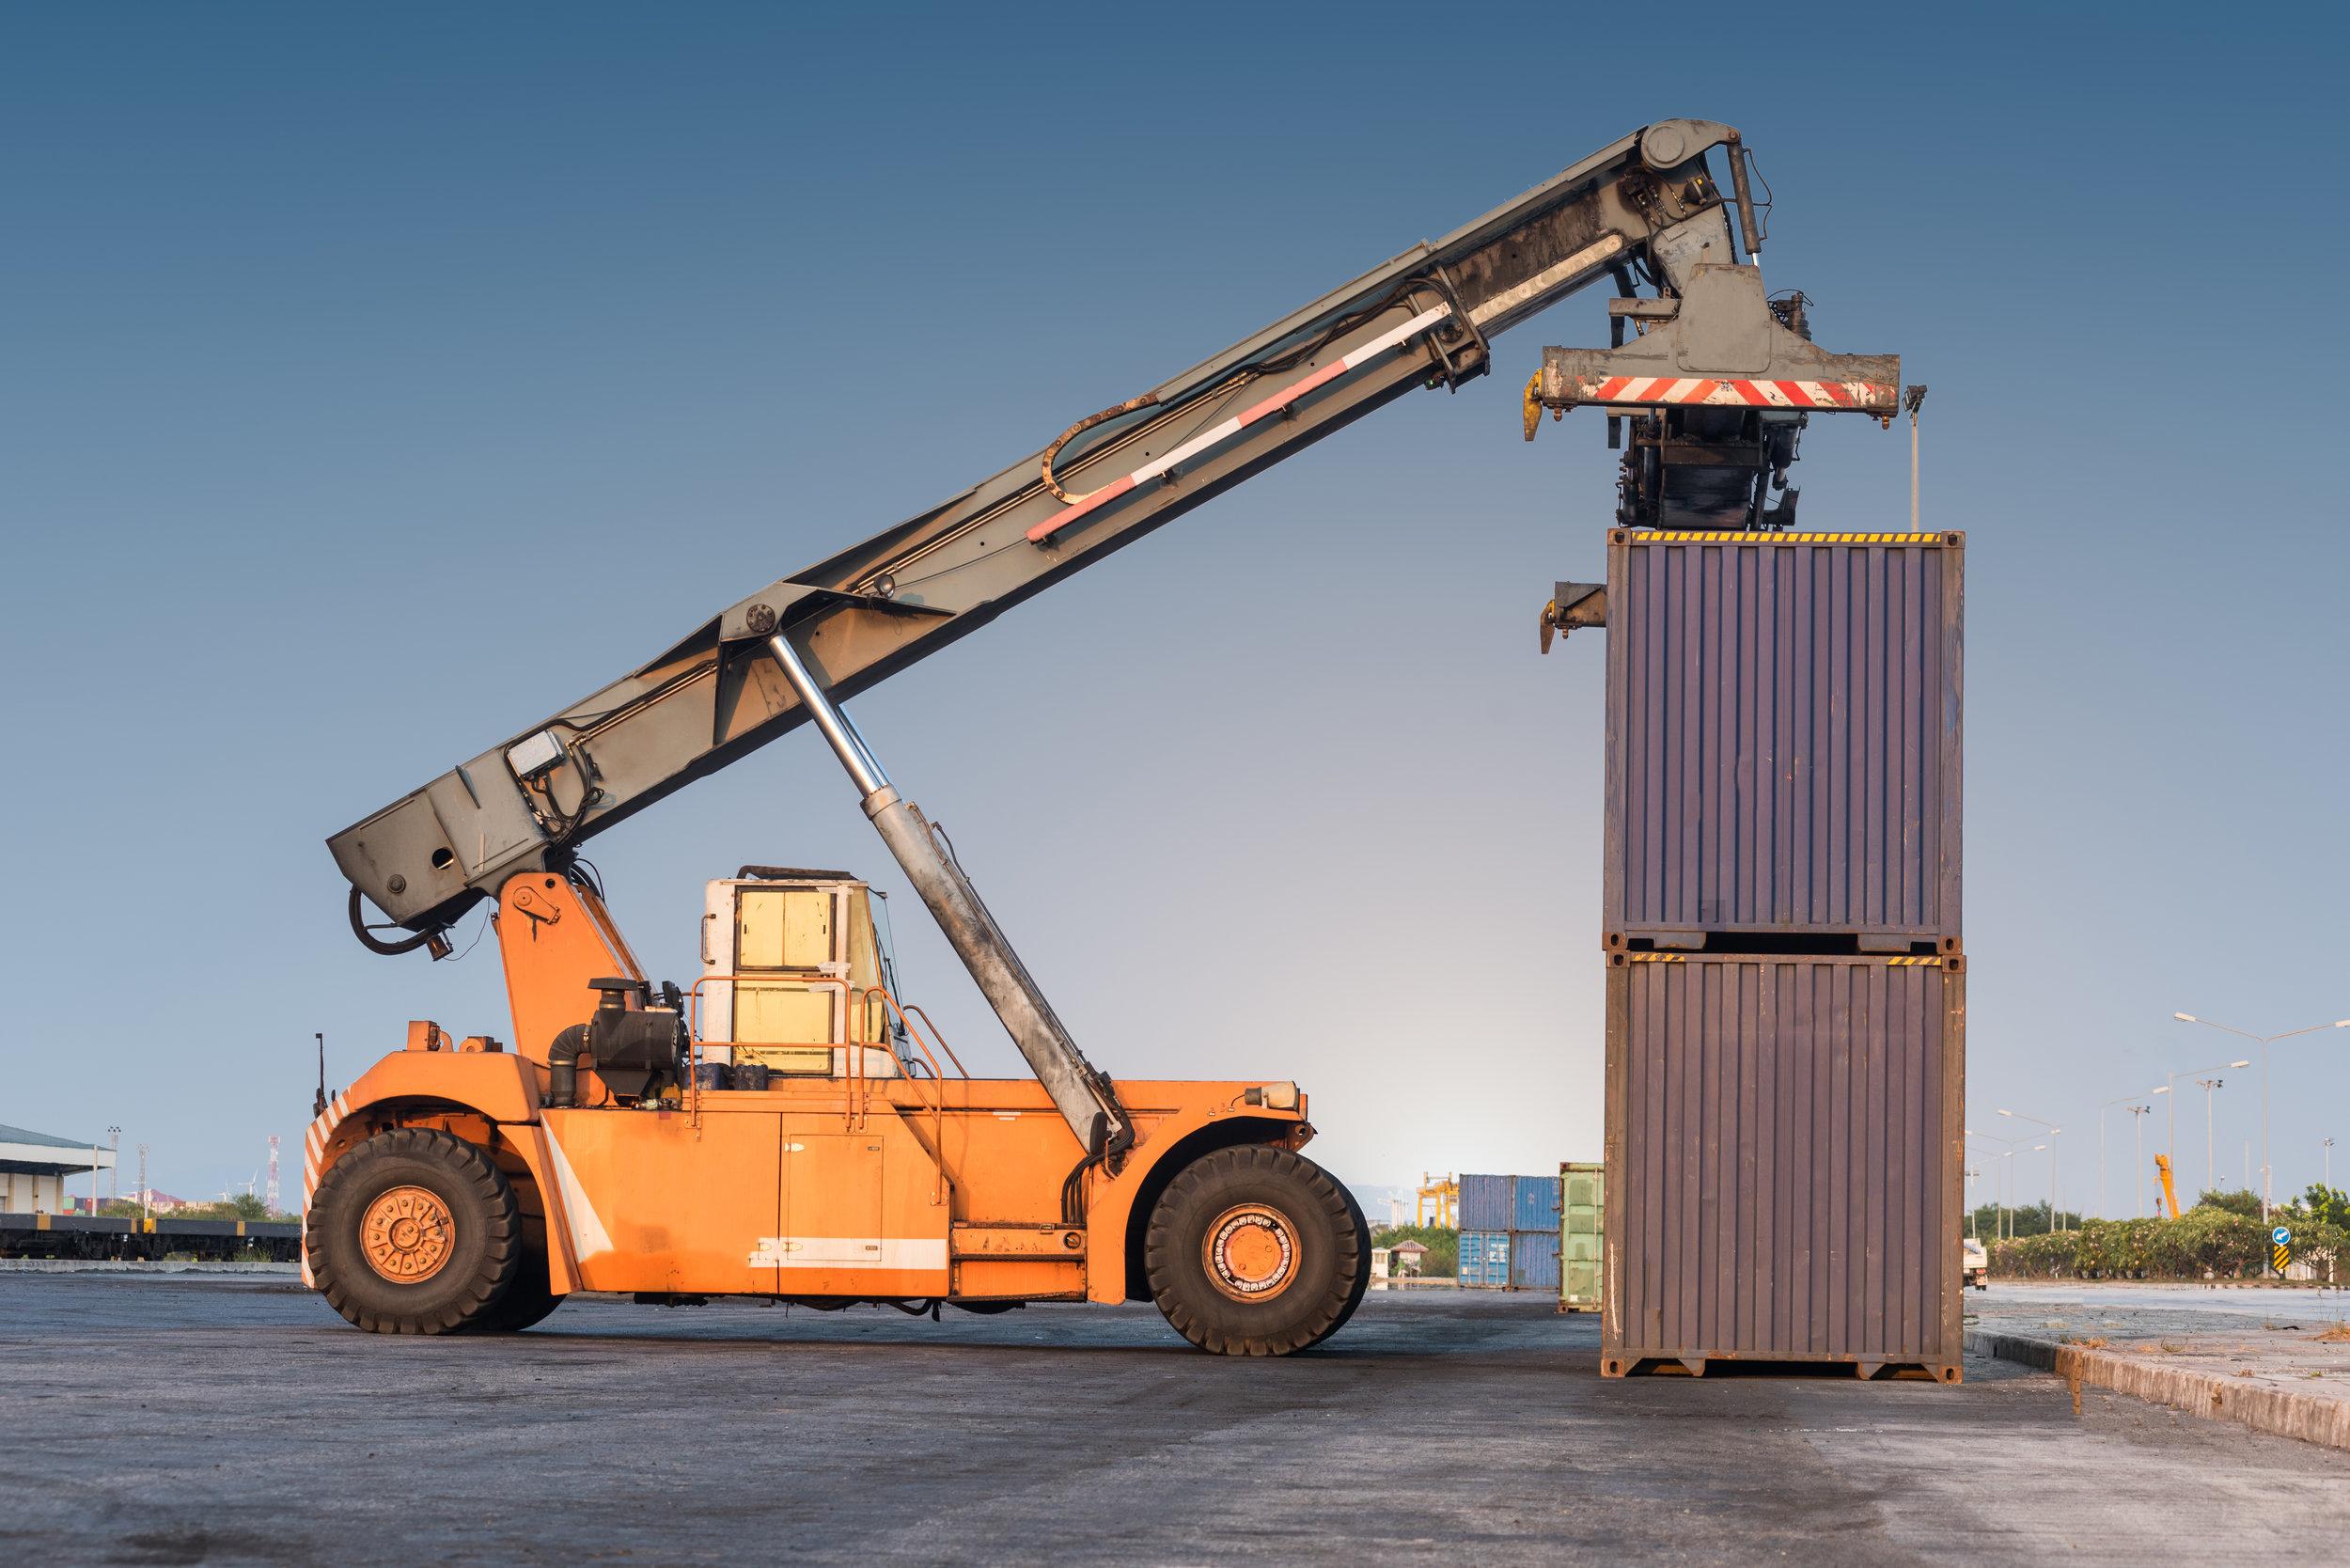 forklifthandlingholdingcontainerbox.jpg